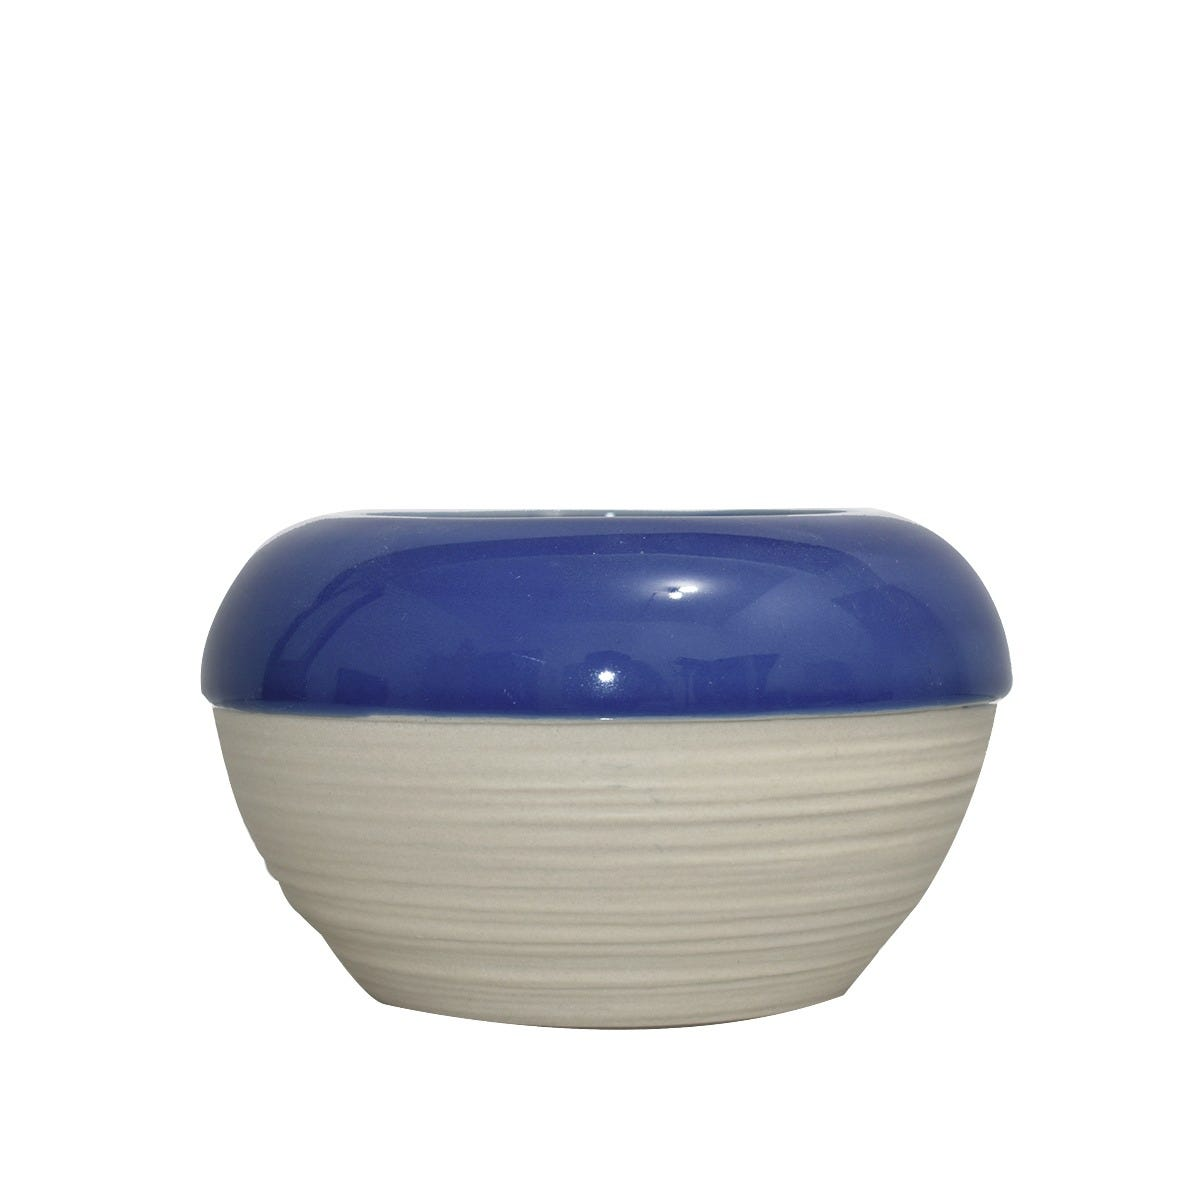 Maceta mediana de cerámica Casa Mejicu® redonda color gris y azul